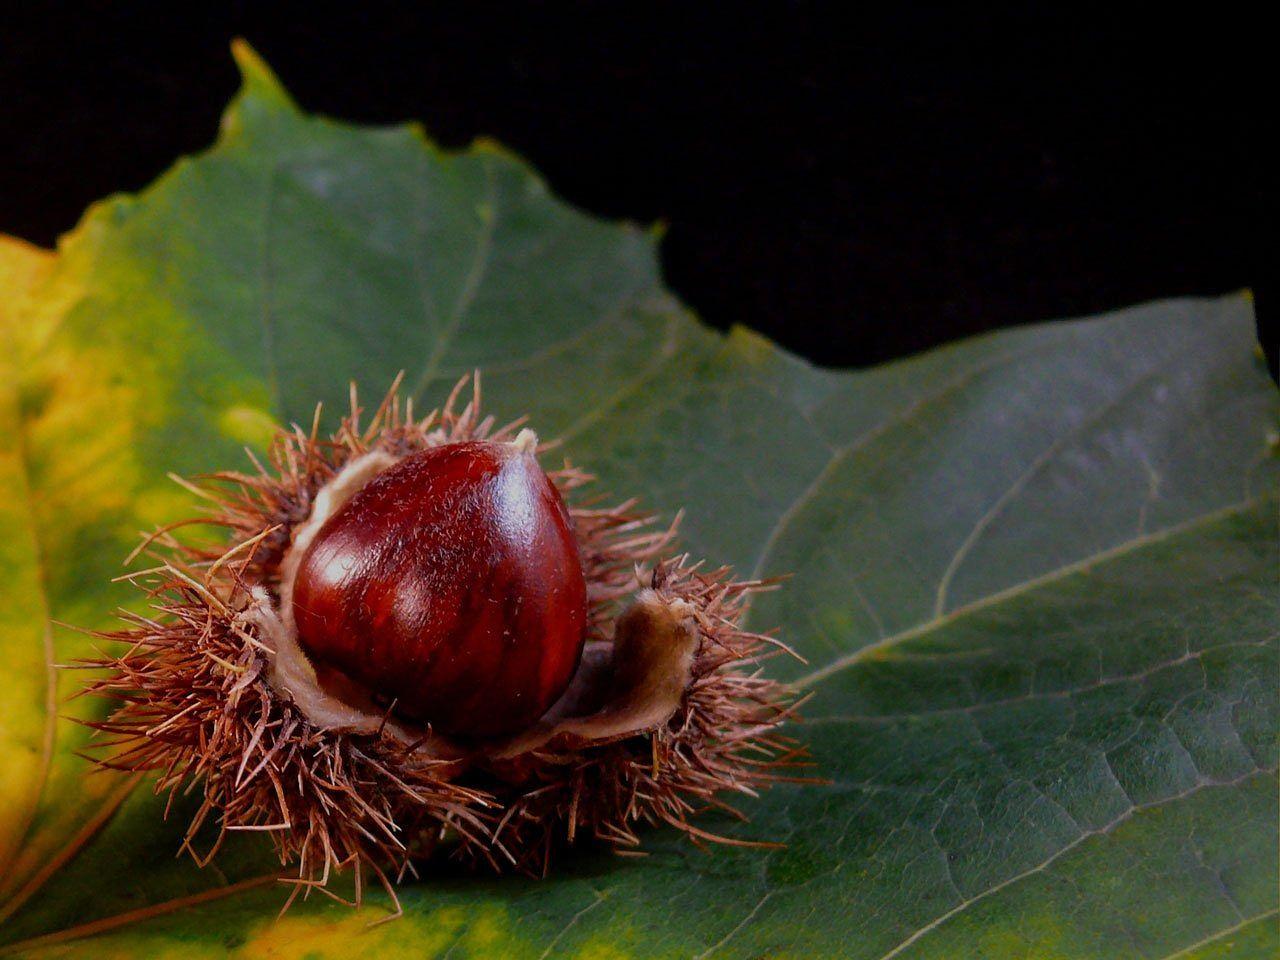 England Leaf Flora Nut Nuts Food Black England Leaf Flora Nut Nuts Food Black No Cook Meals Holidays In England Black Tree